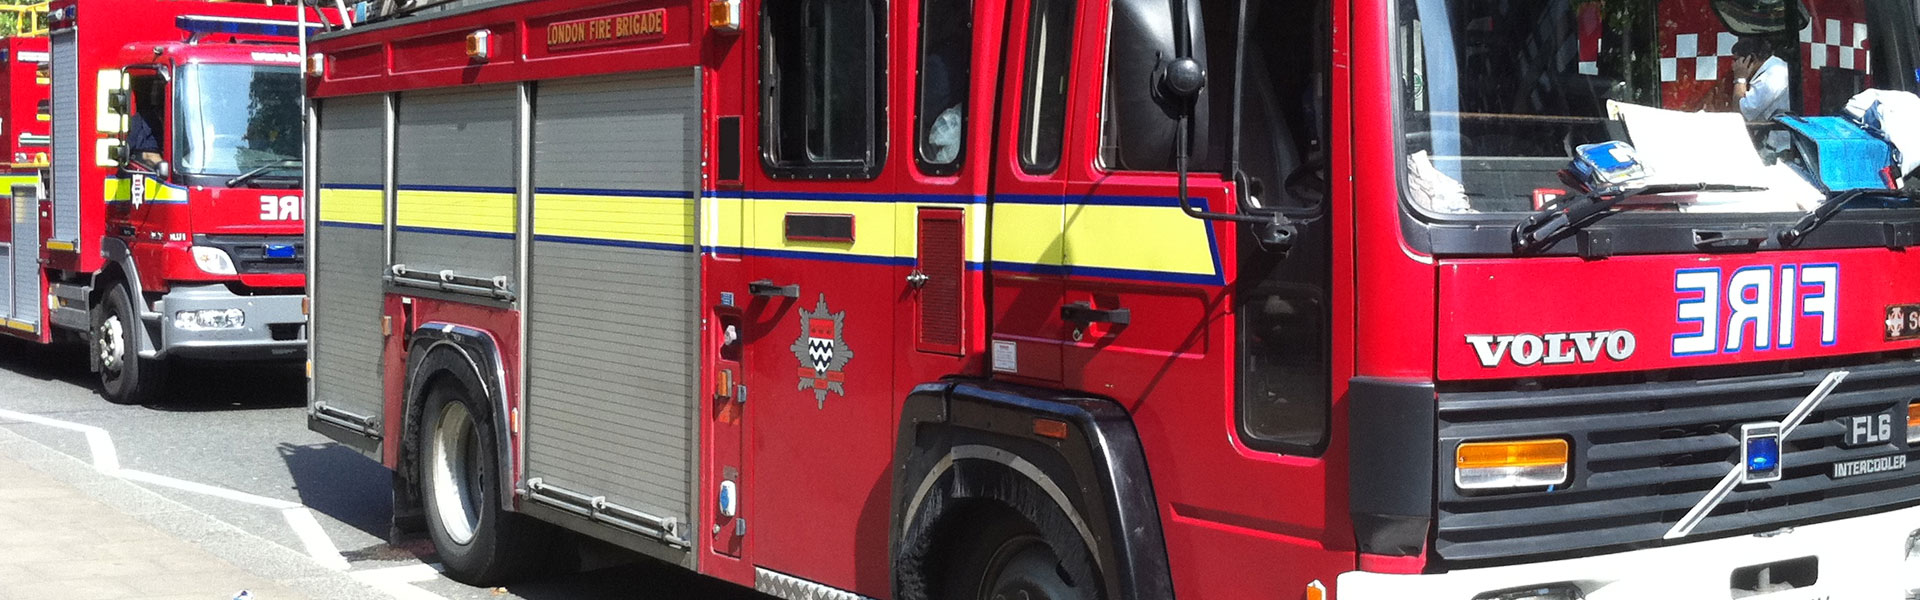 fire service access